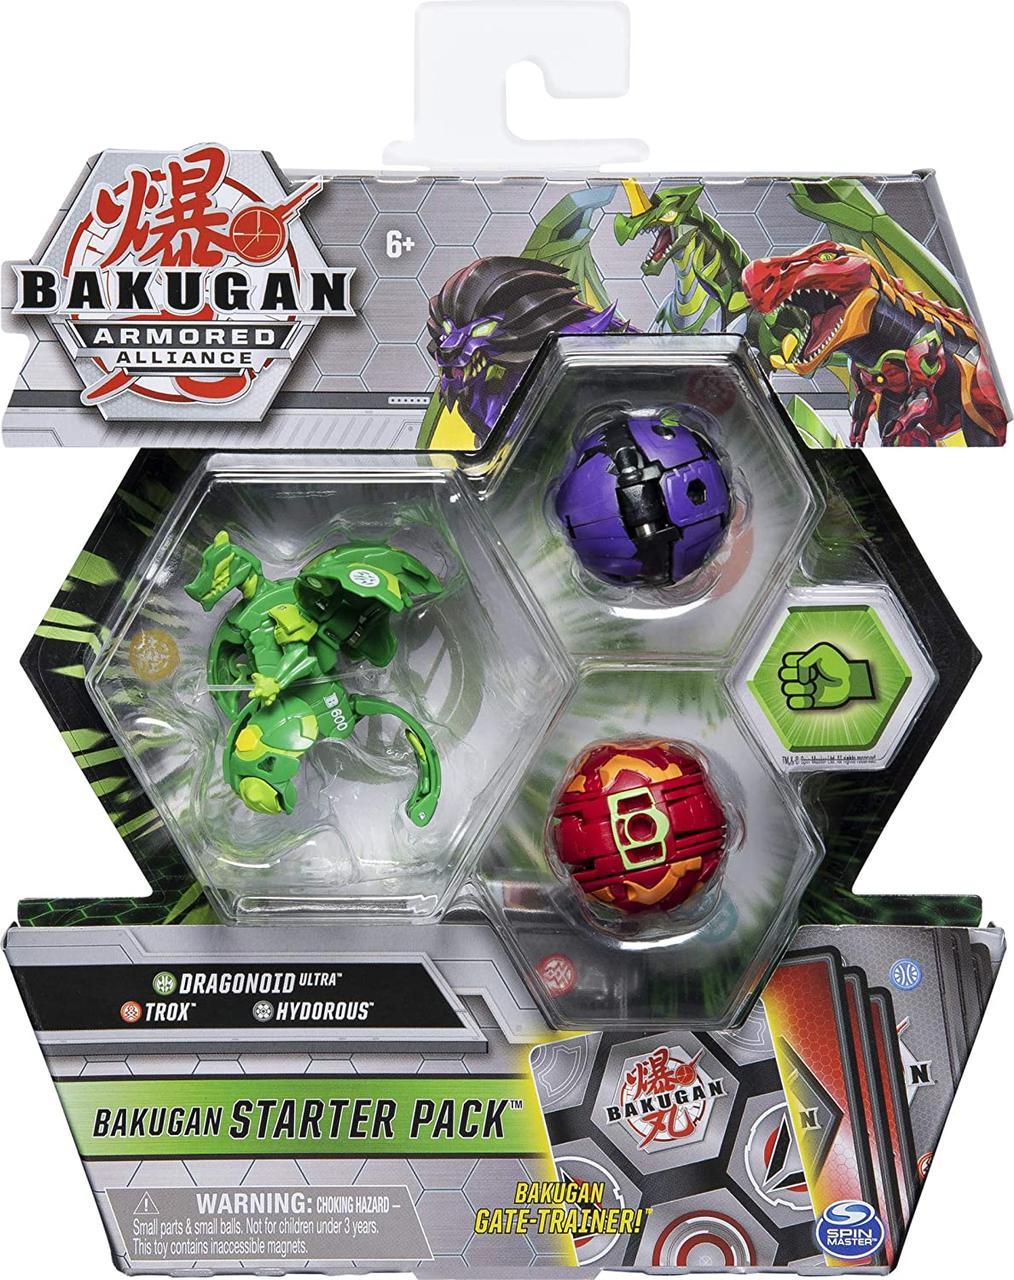 Стартовый набор из 3 бакуганов Bakugan Starter Pack 3-Pack Armored Allian